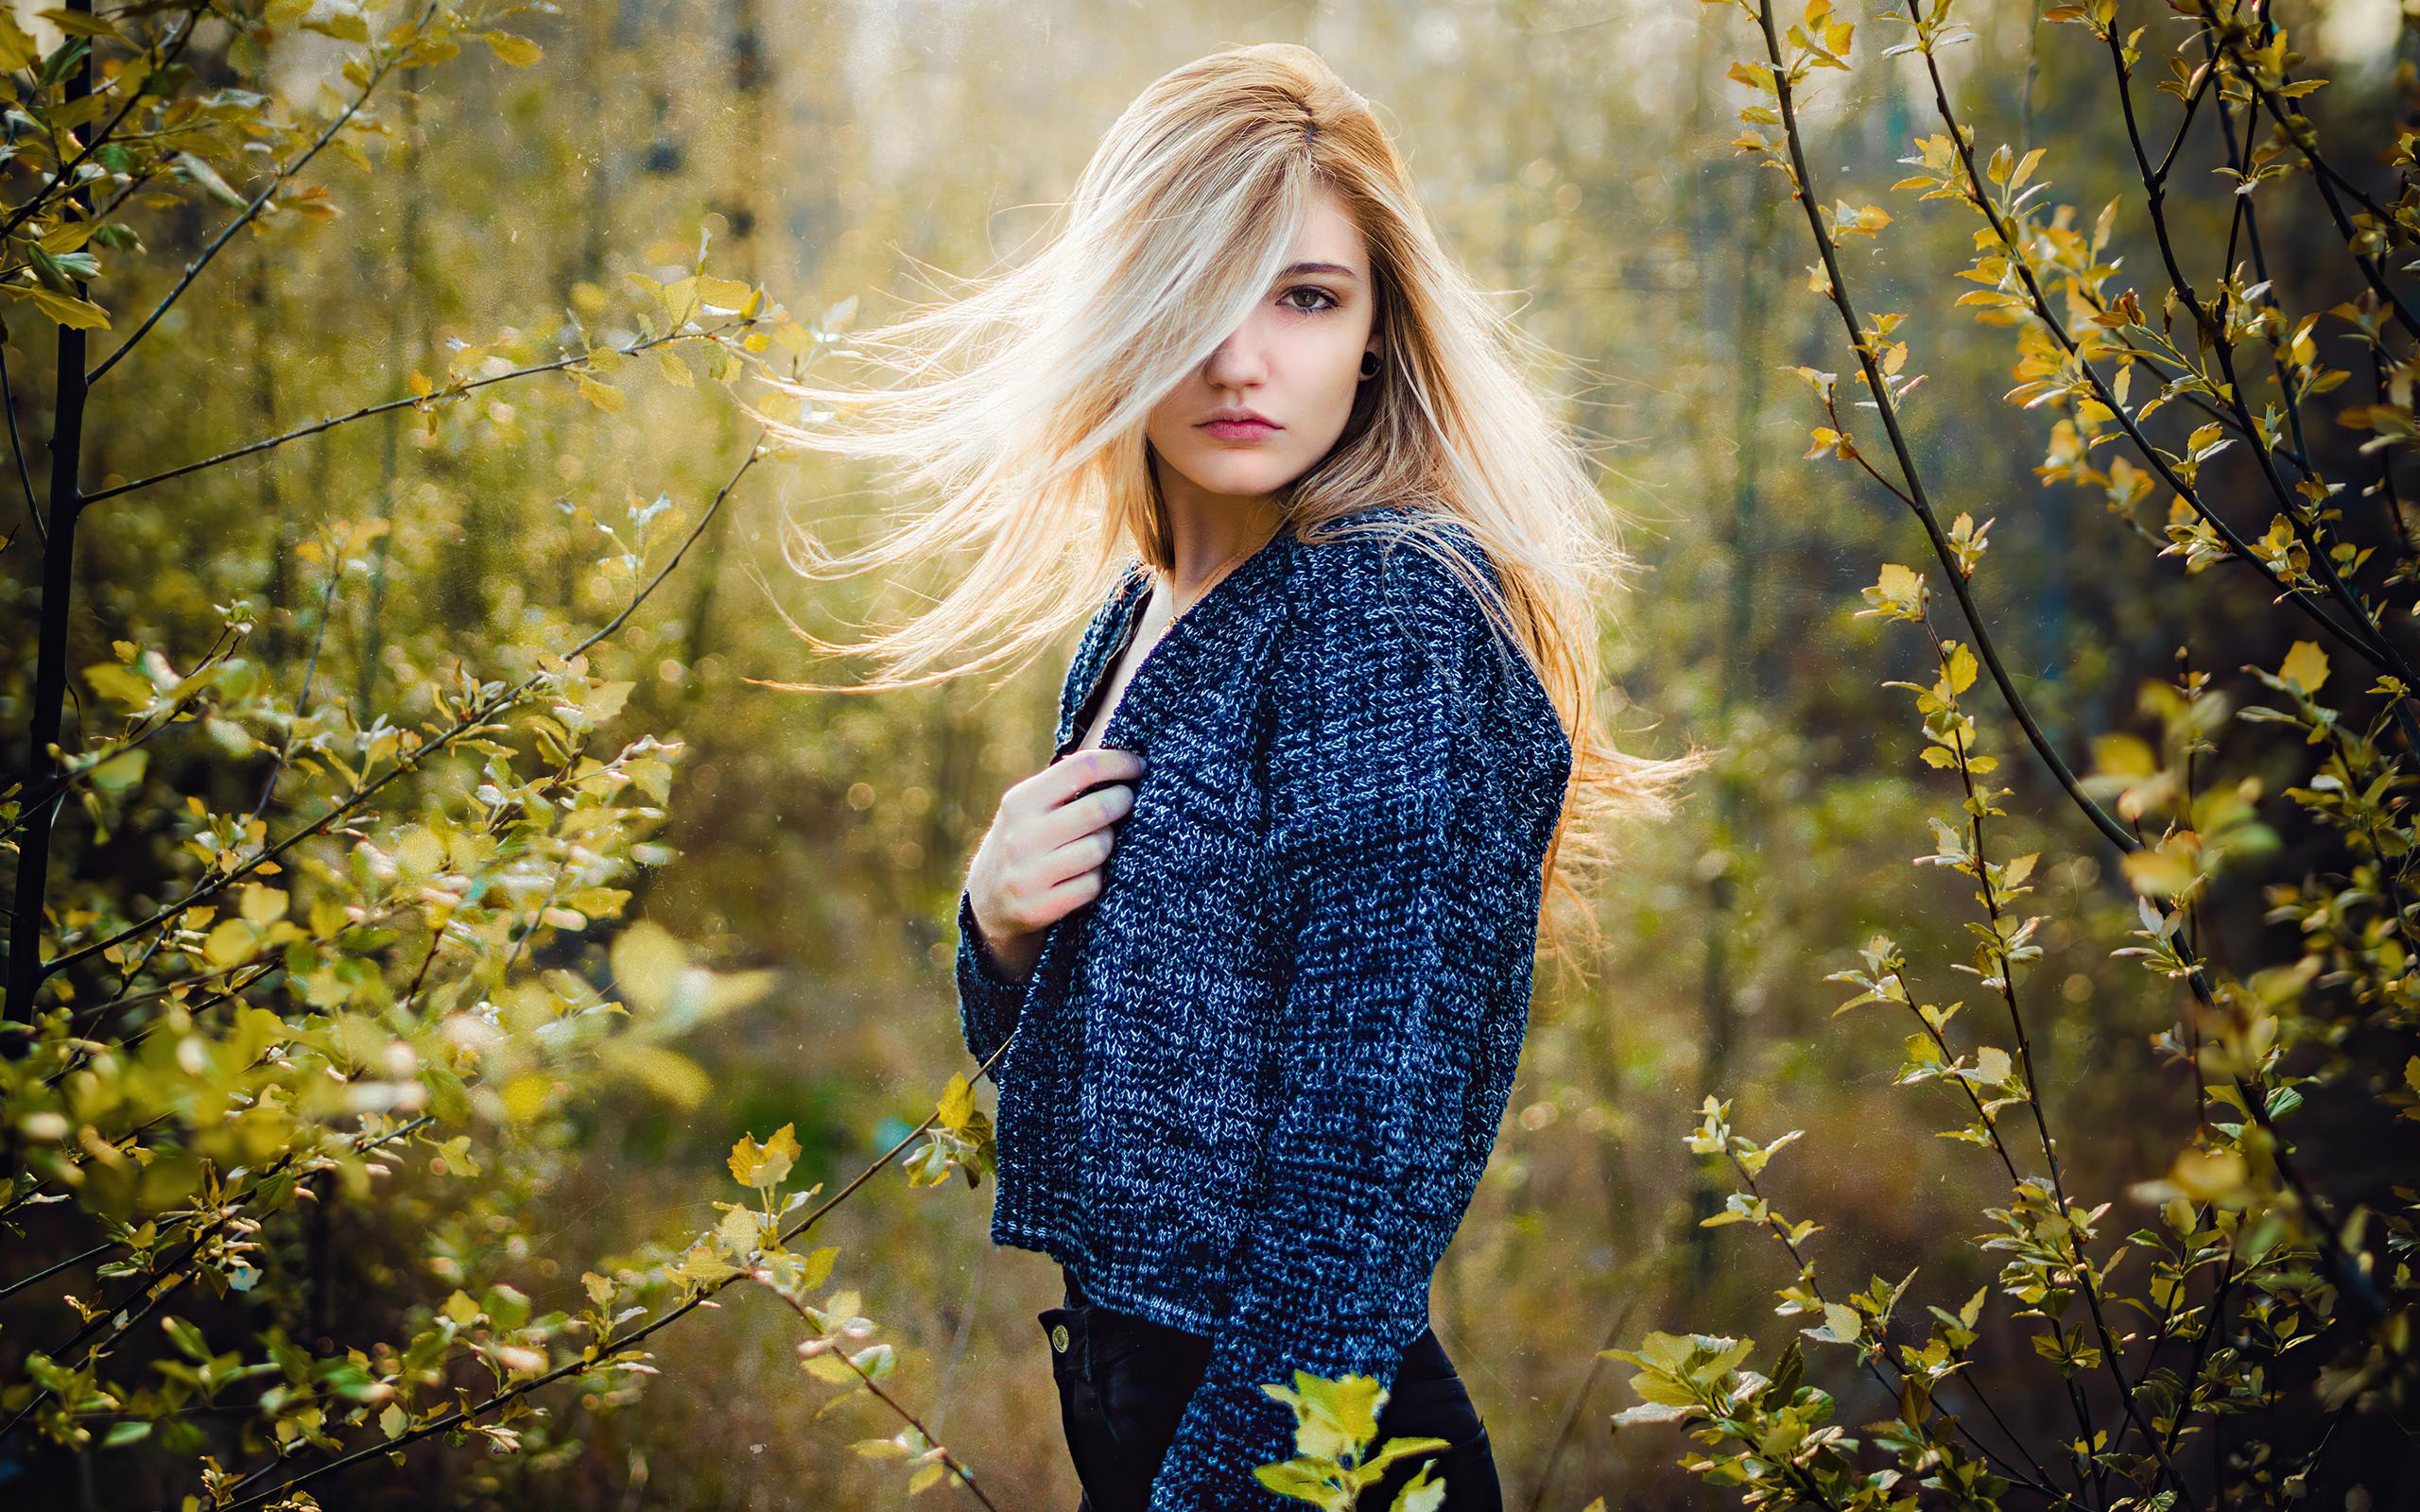 blonde-beautiful-girl-hair-on-face-4k-qi.jpg